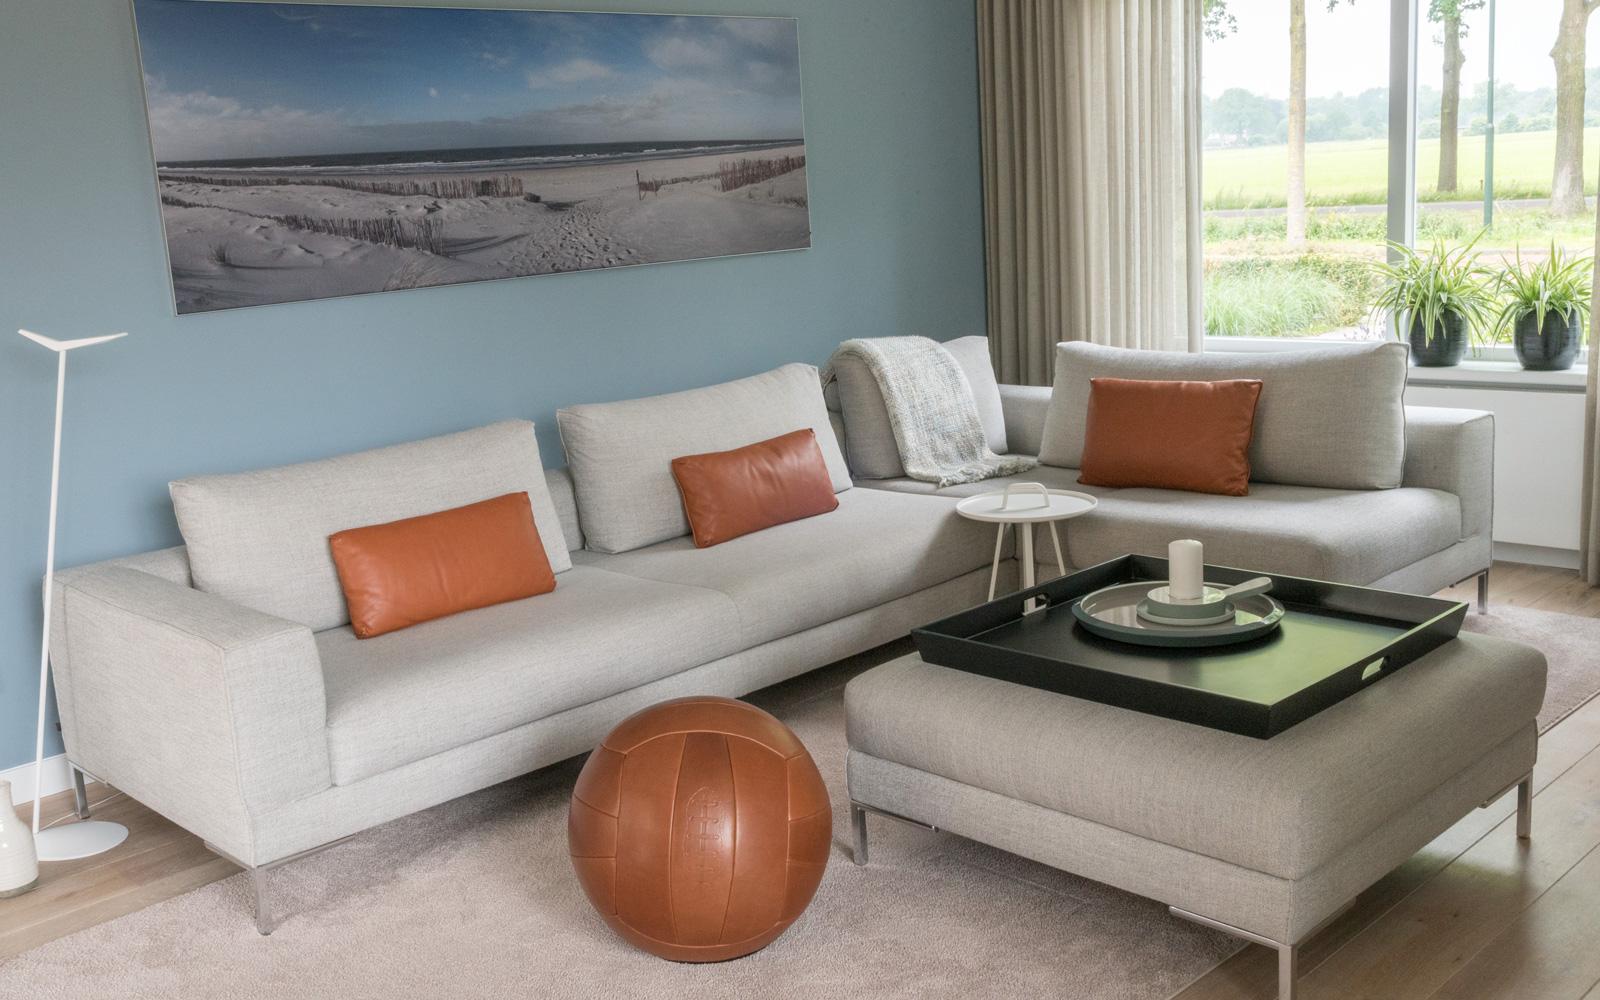 Woonkamer, bank, kussens, comfortabel, lounge, verbouwing, interieur, MarStyling